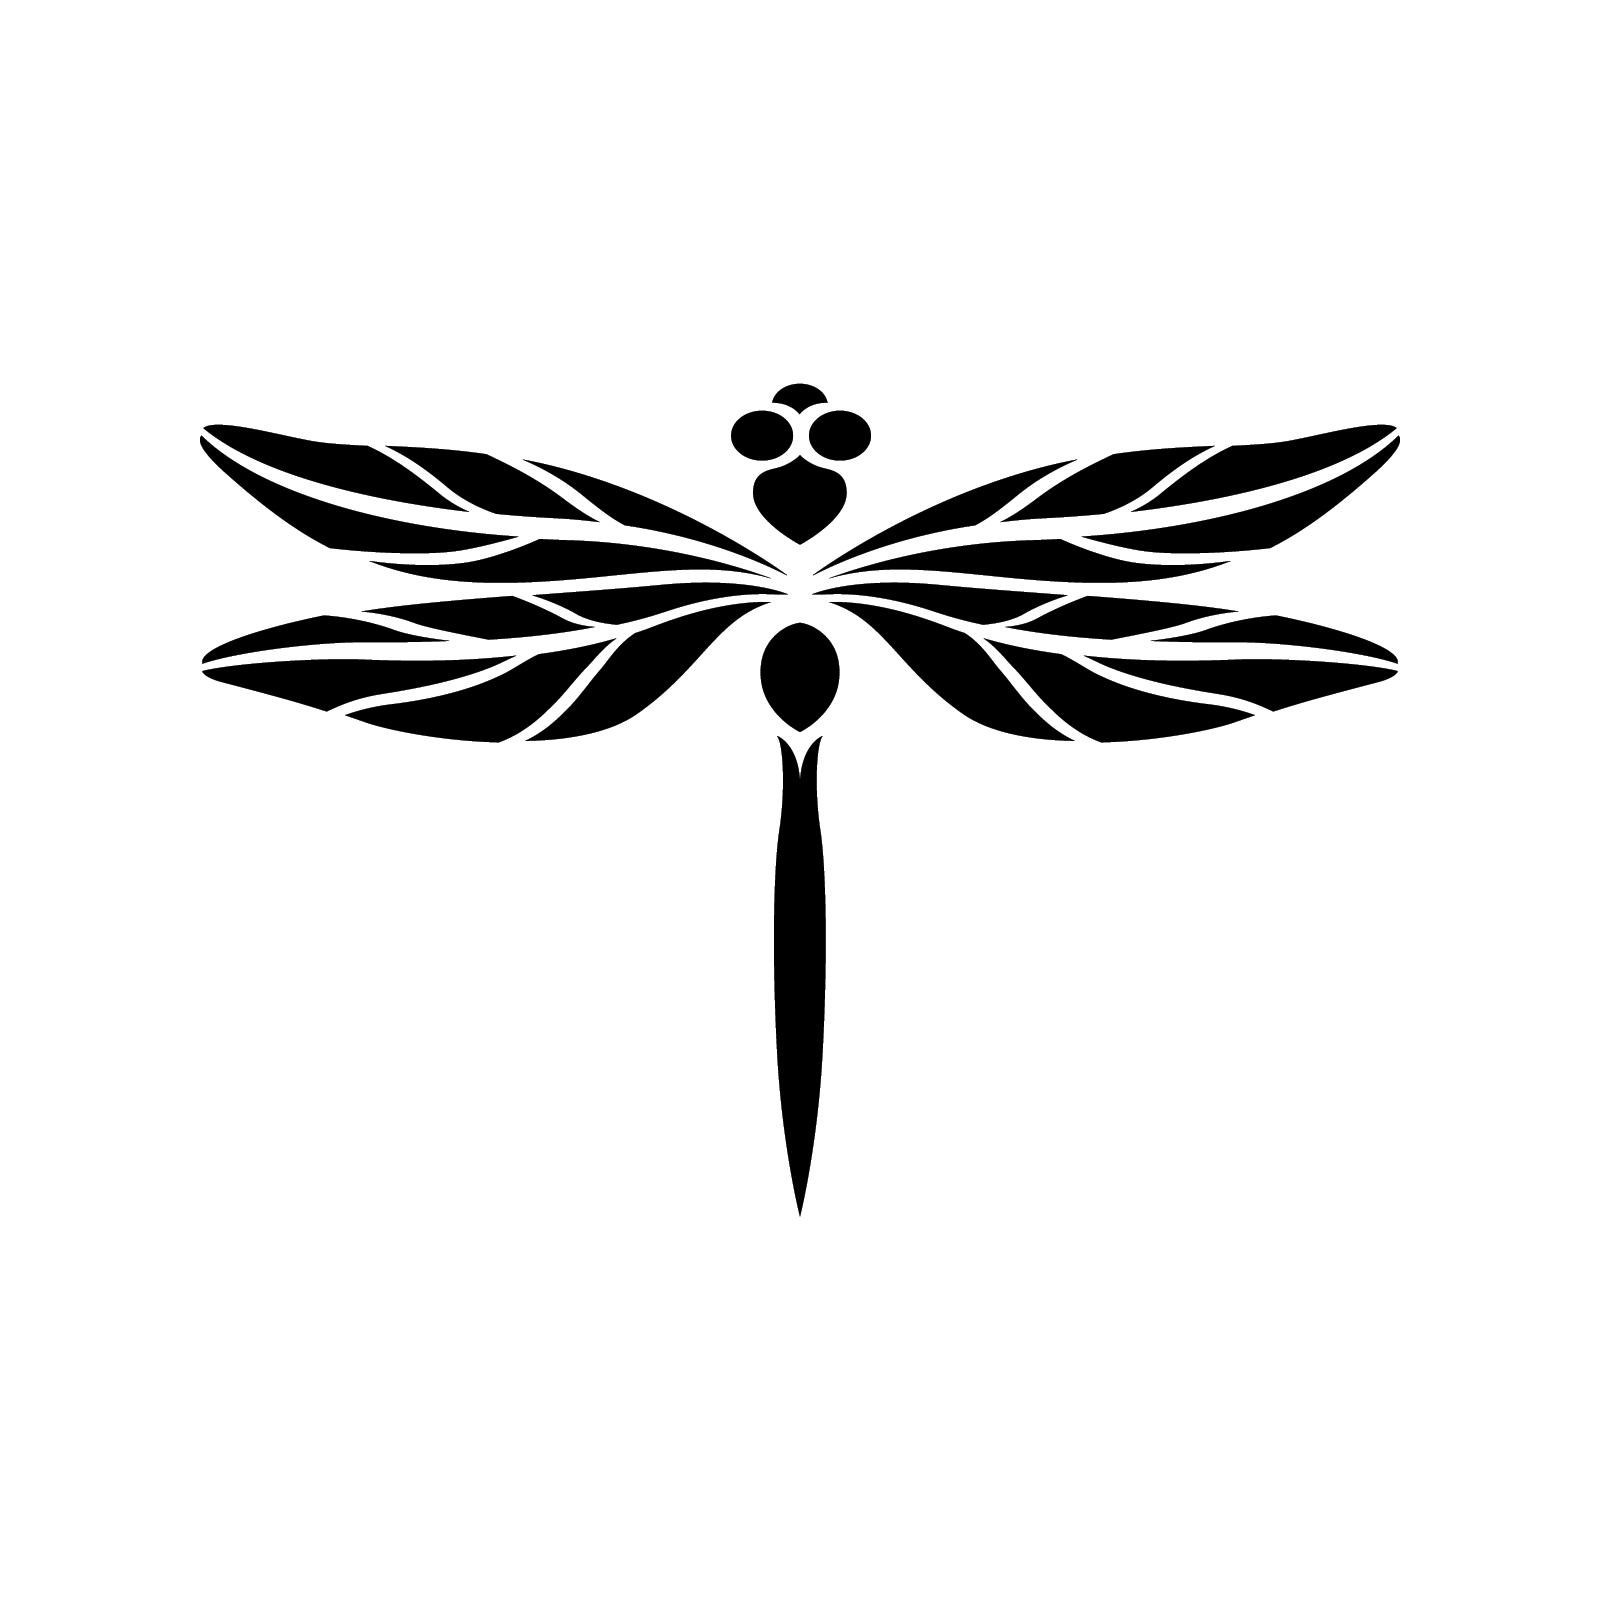 Dragonfly Stencil Dragonfly Dragonfly Art Dragonfly Silhouette